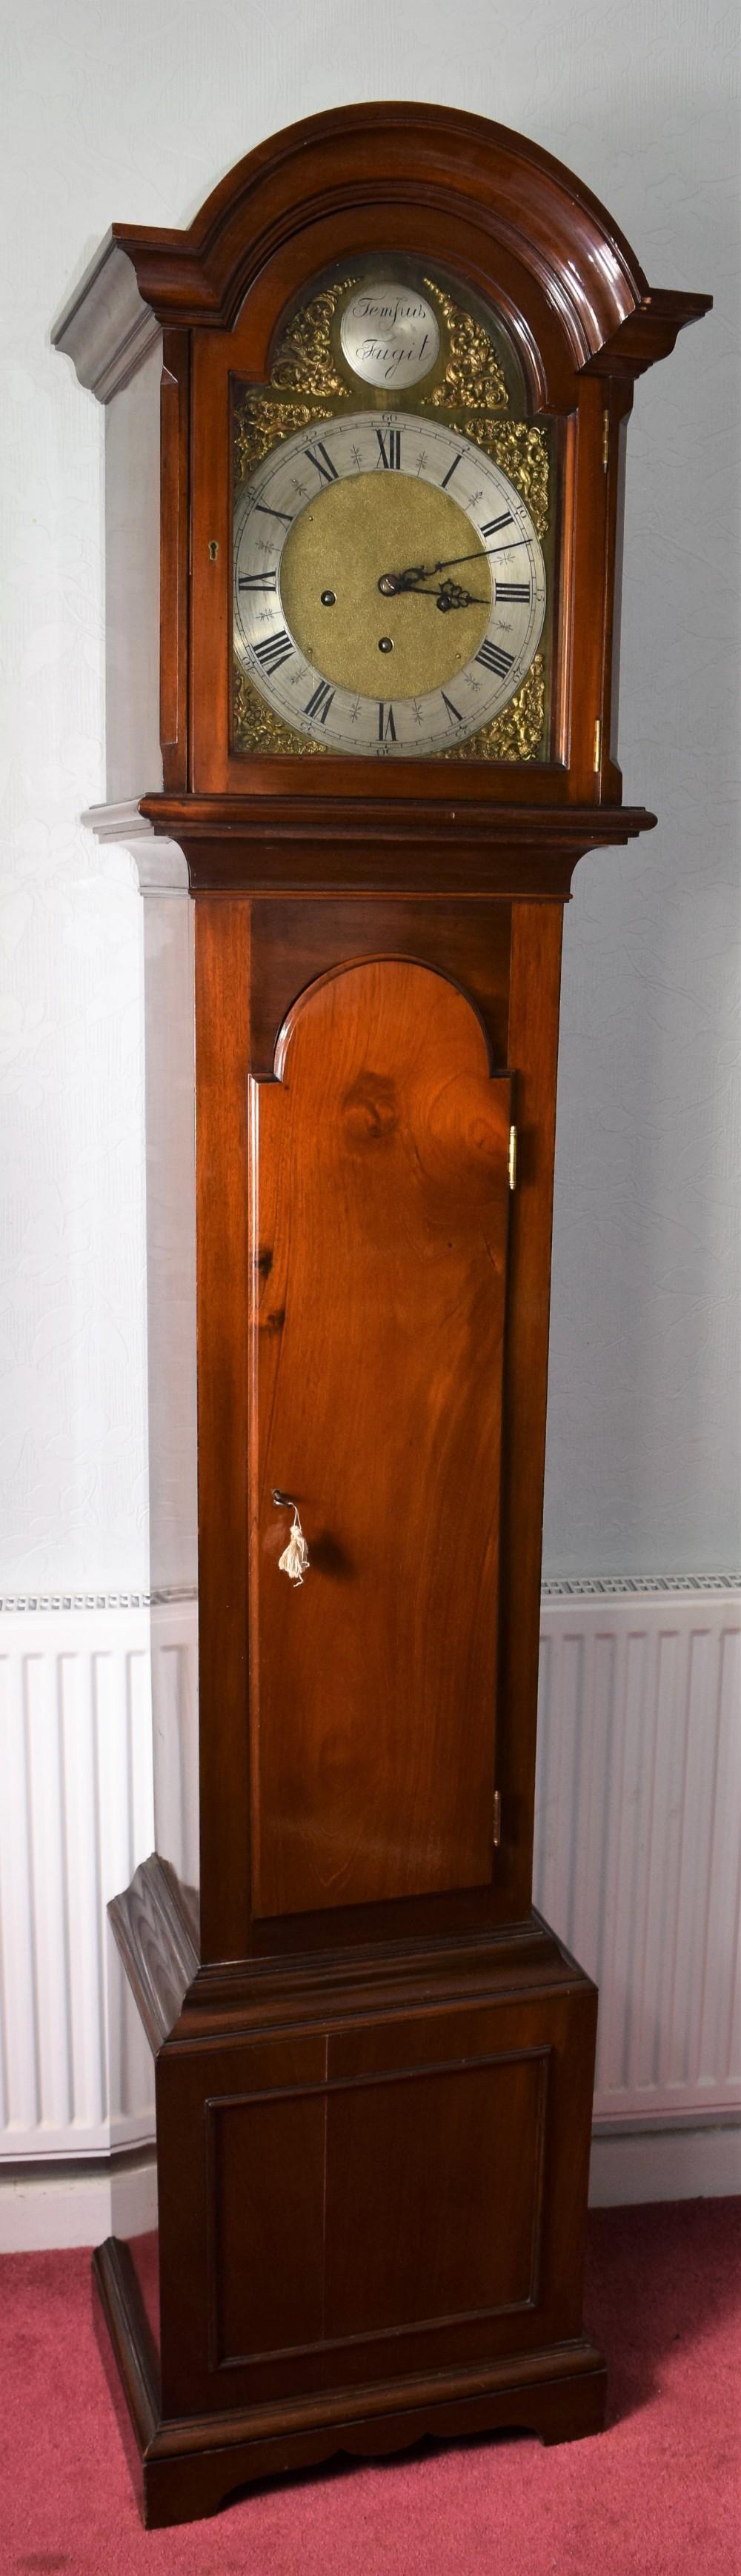 solid mahogany early 20th century grandfather longcase musical chiming clock